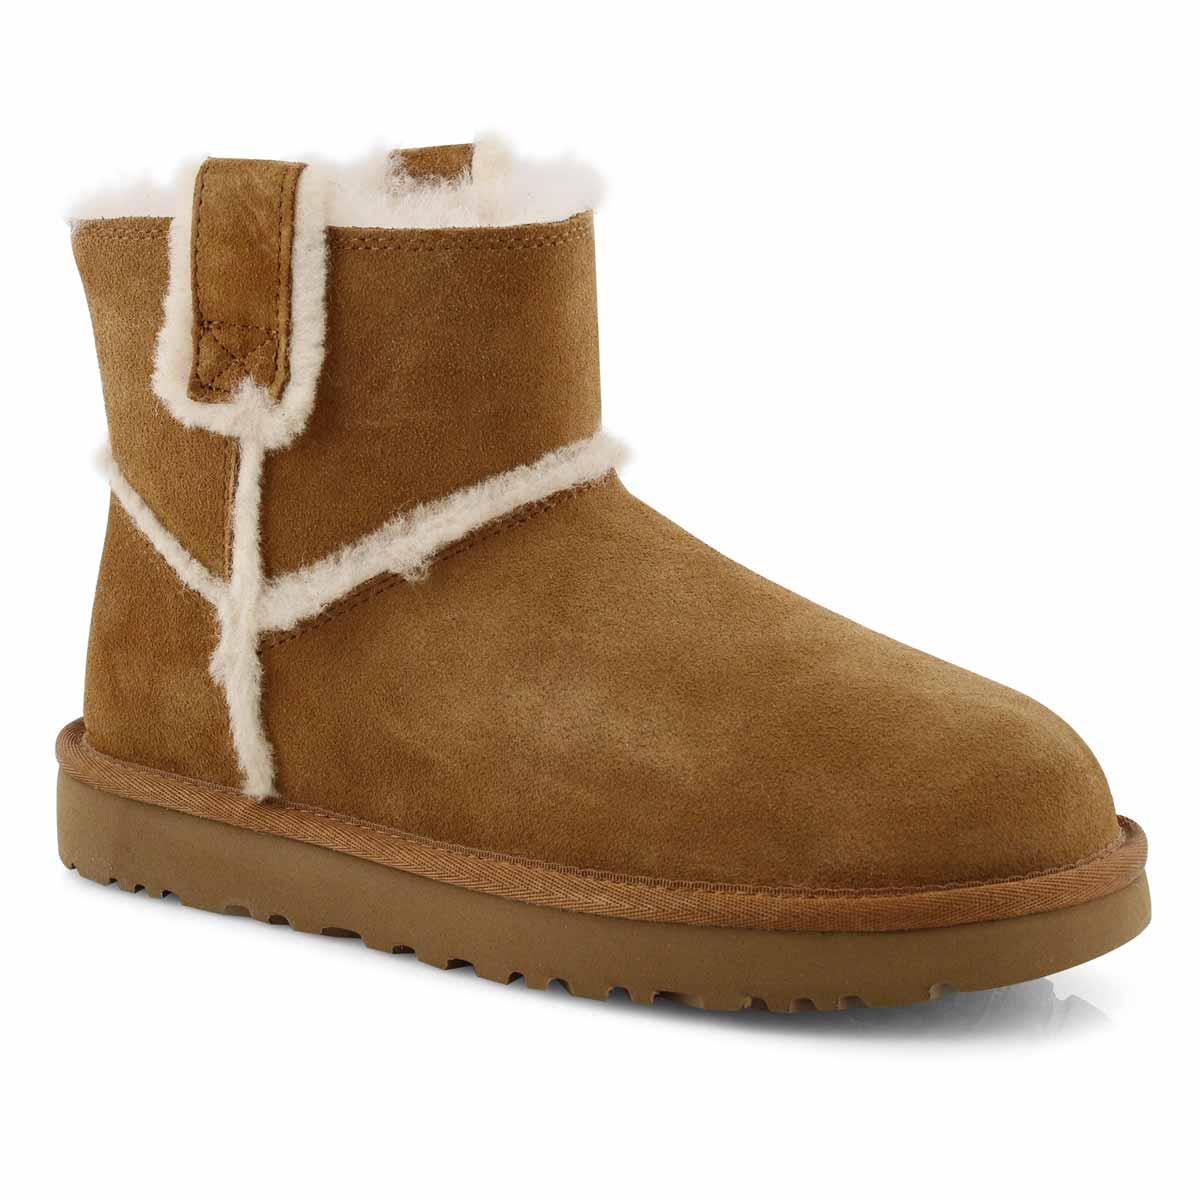 Women's CLASSIC MINI SPILL SEAM chestnut boots